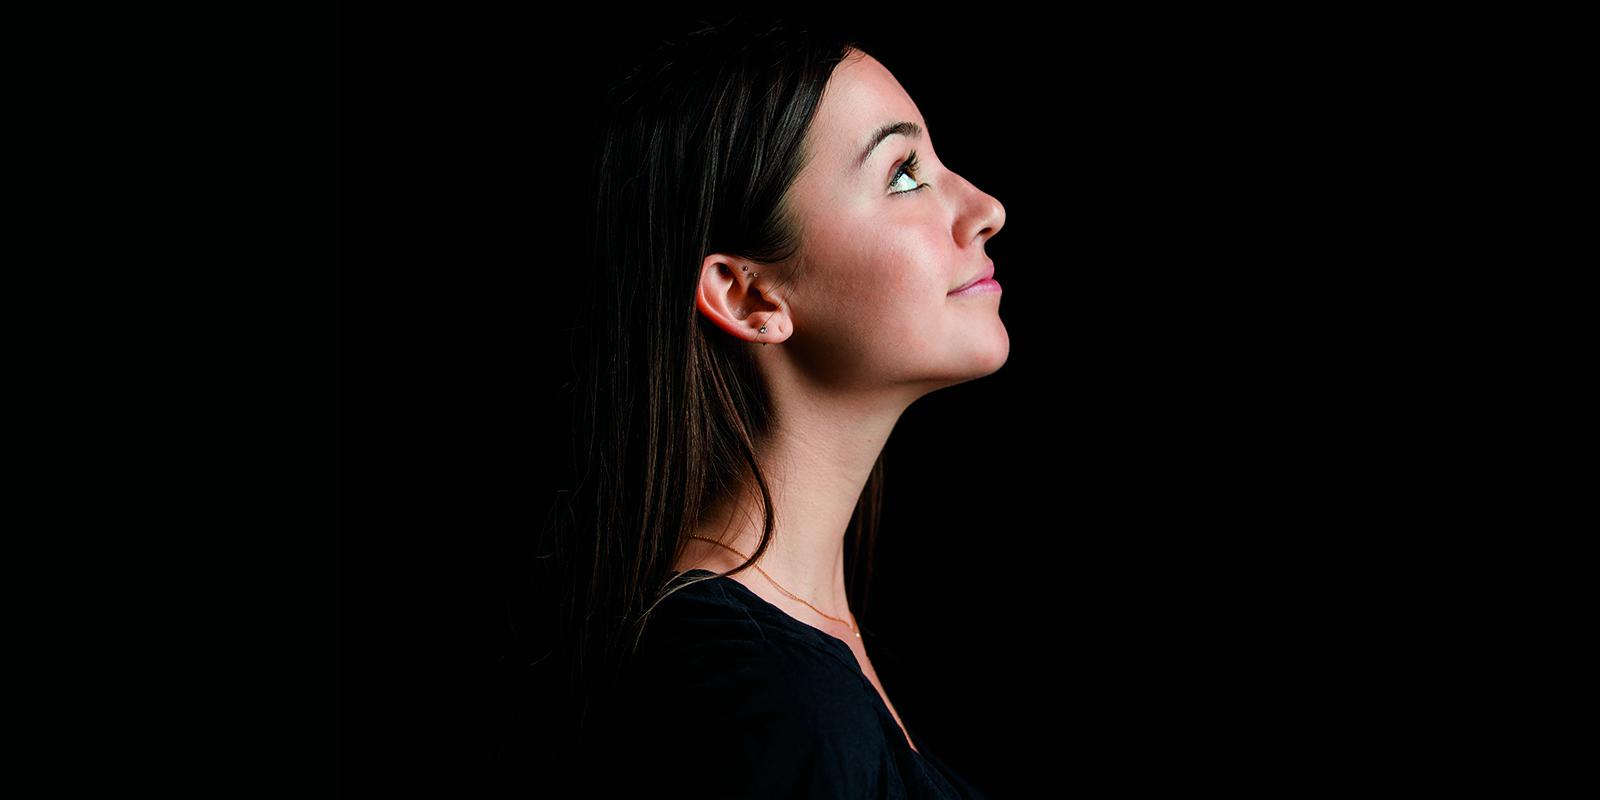 Erin Carollo looks up in profile